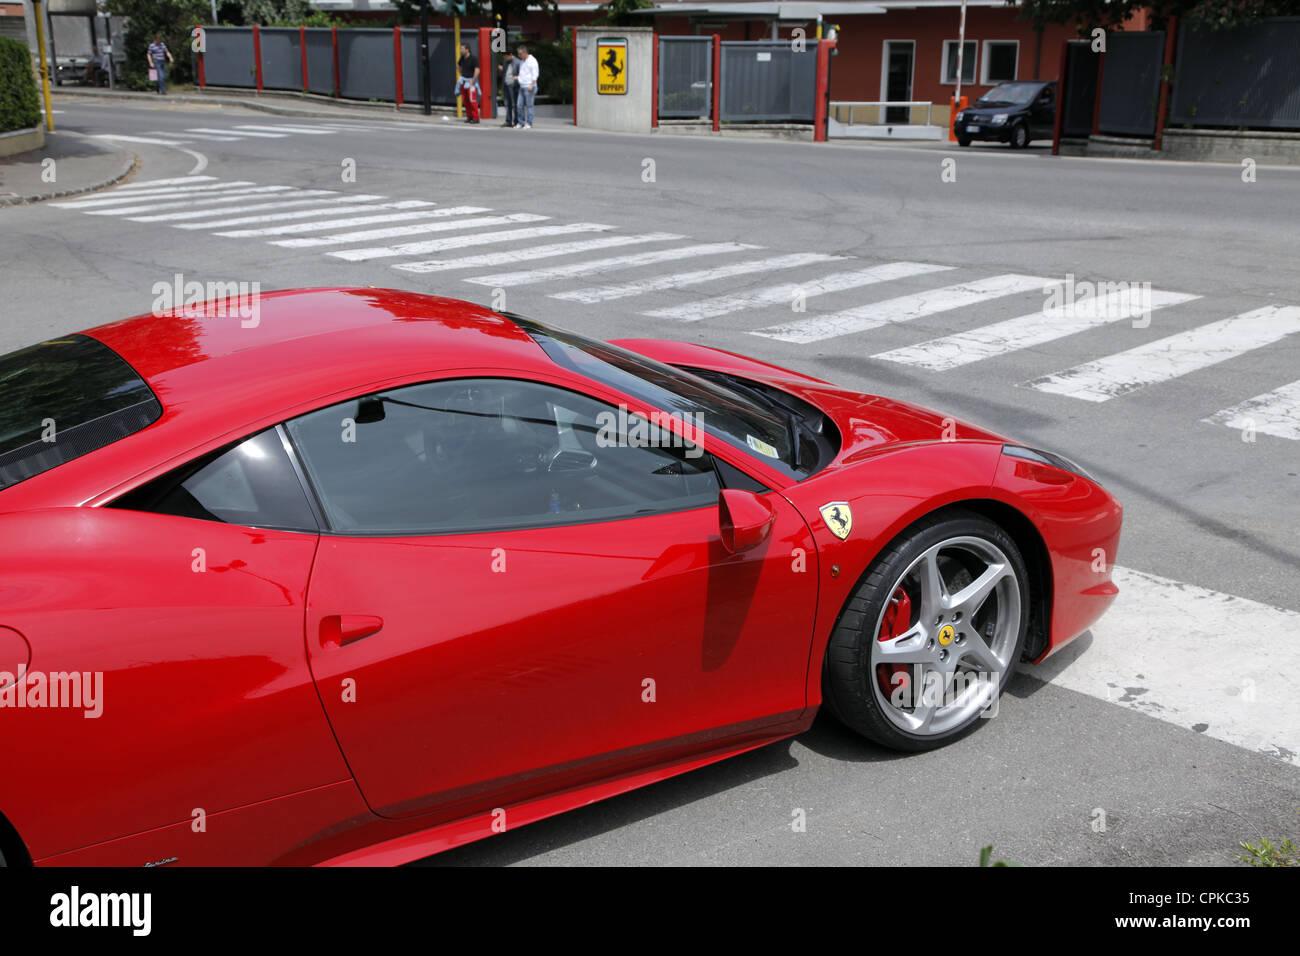 Rojo FERRARI 458 coches & FÁBRICA MARANELLO Italia 08 de mayo de 2012 Imagen De Stock